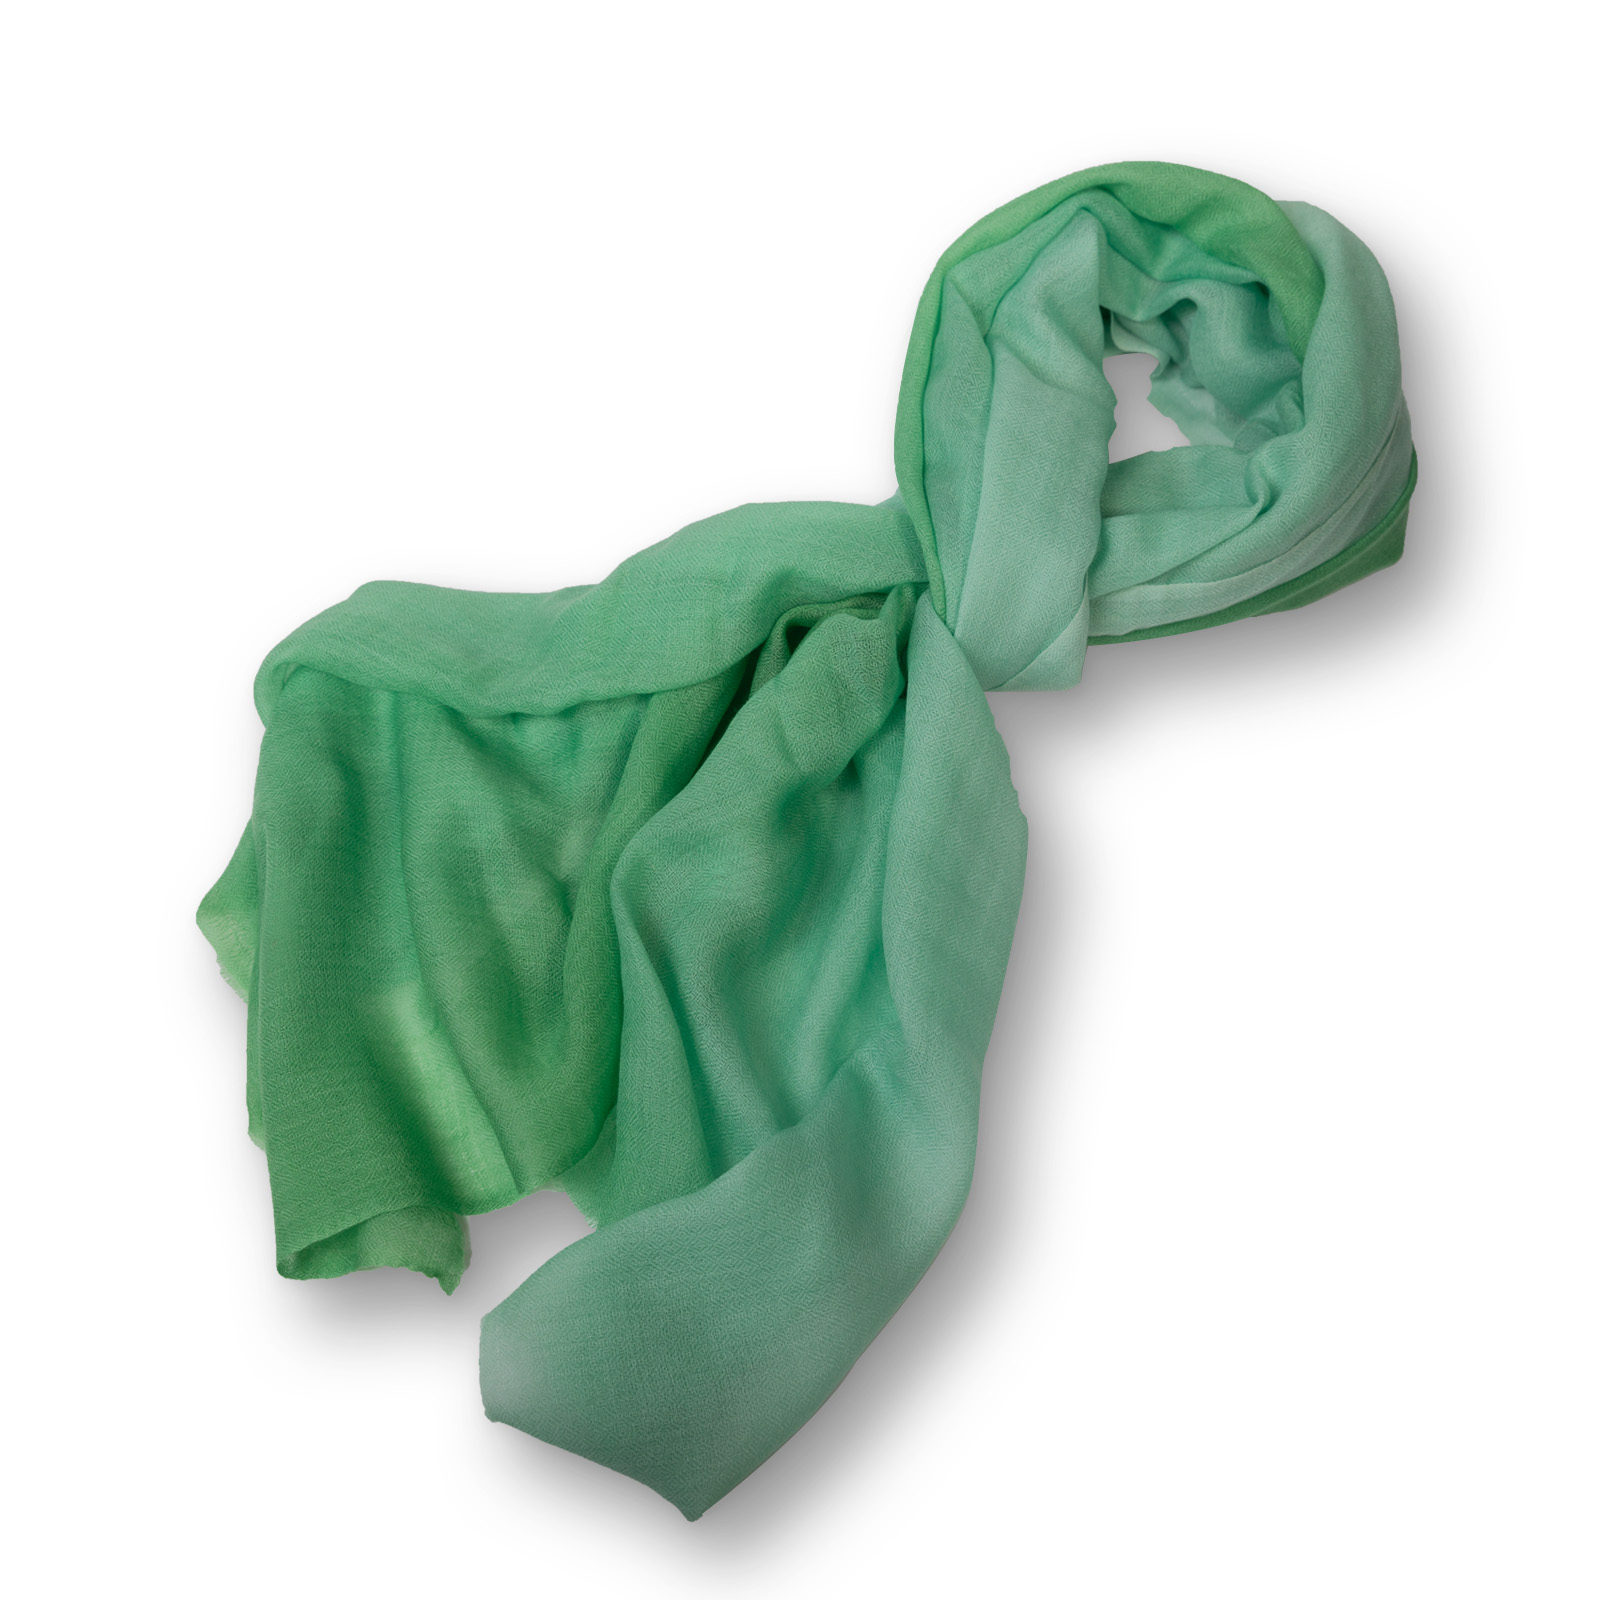 Pashmina - 100%  Cashmere  zweifarbig aus Nepal  70x200 cm grün-hellgrün